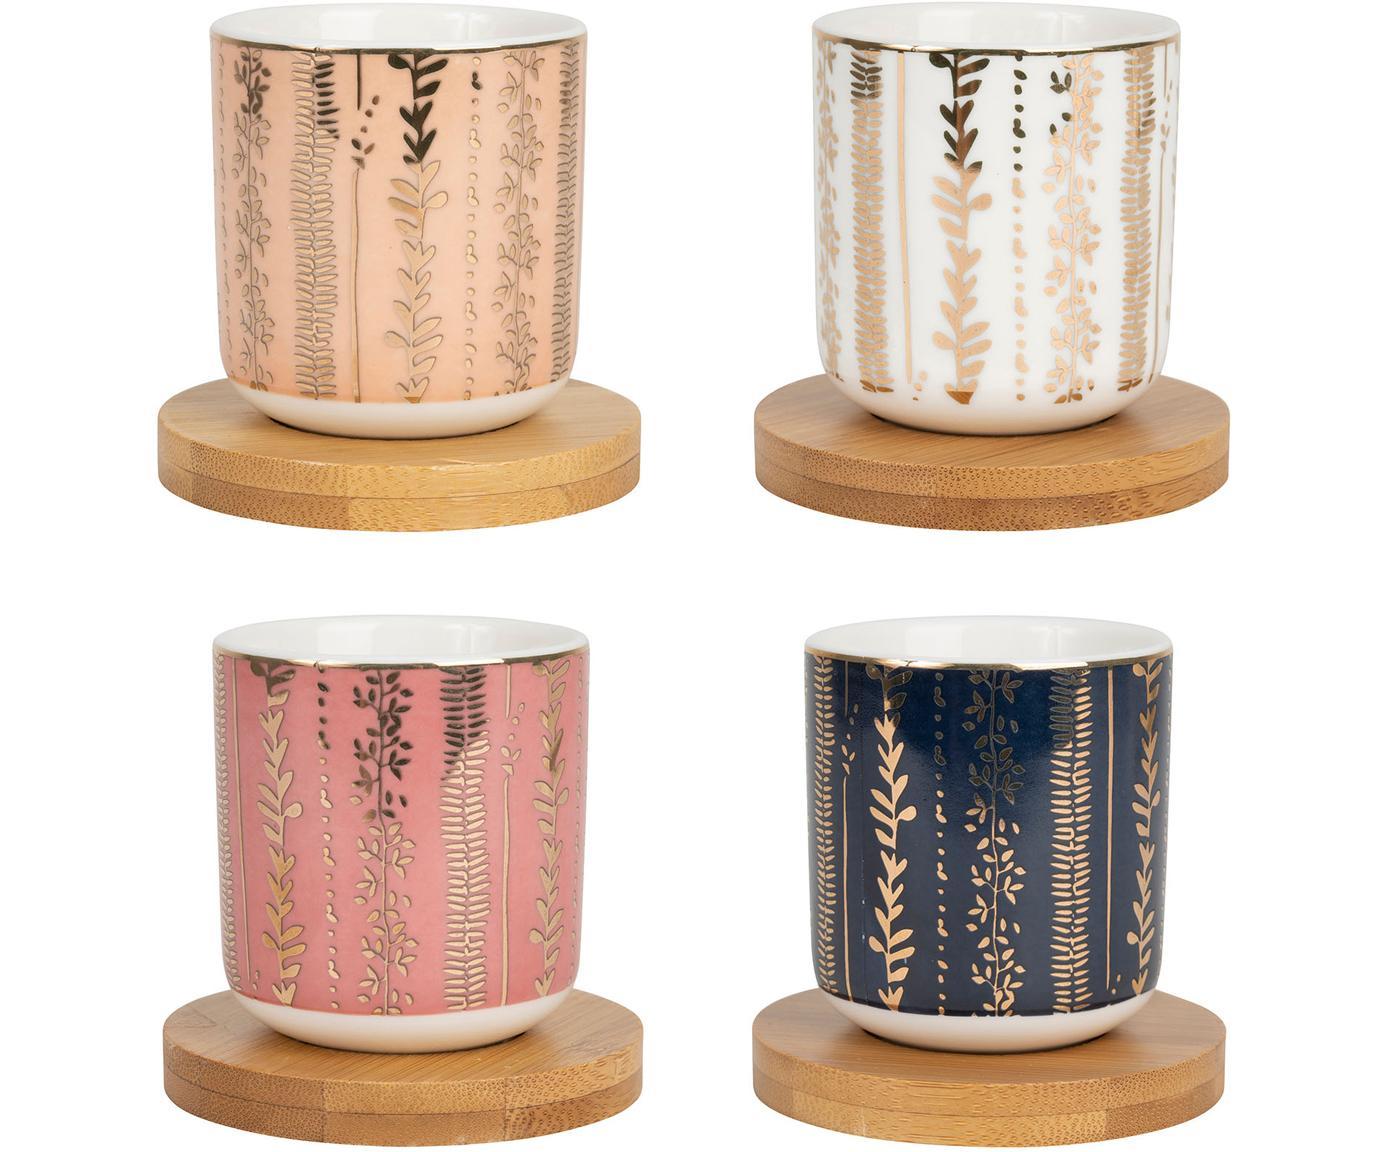 Espressobecher-Set Veg-Gold mit Untertassen, 8-tlg., Porzellan, Bambus, Rosa, Blau, Ø 6 x H 7 cm